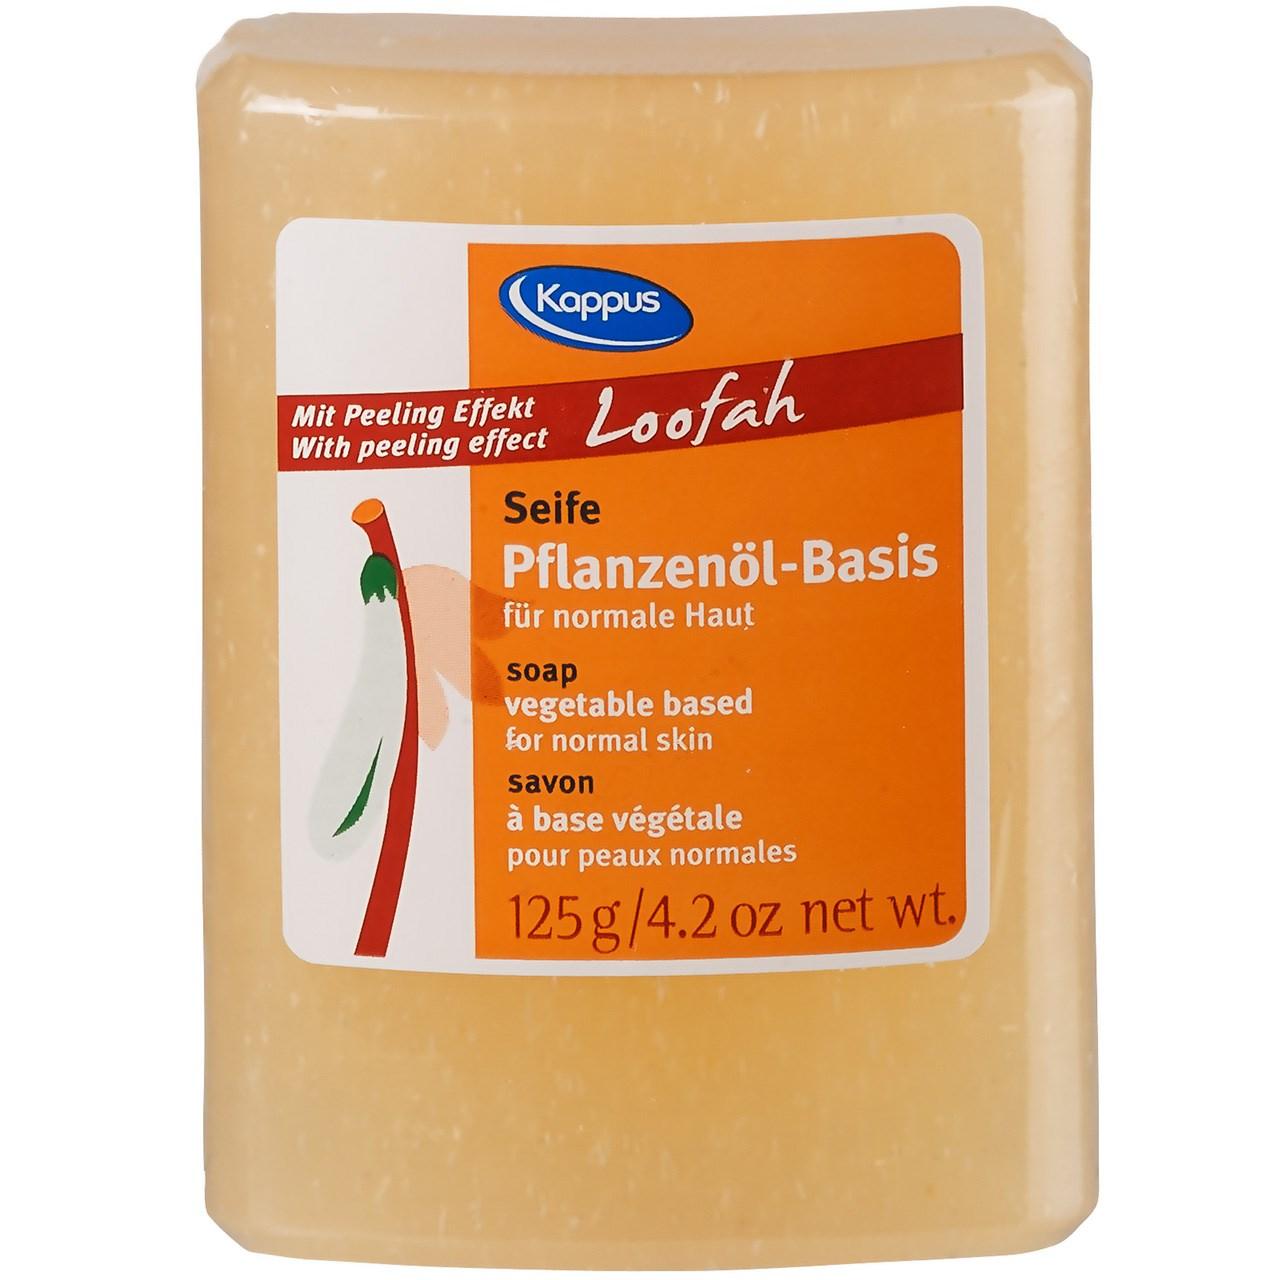 صابون لایه بردار کاپوس مدل Loofah مقدار 125 گرم